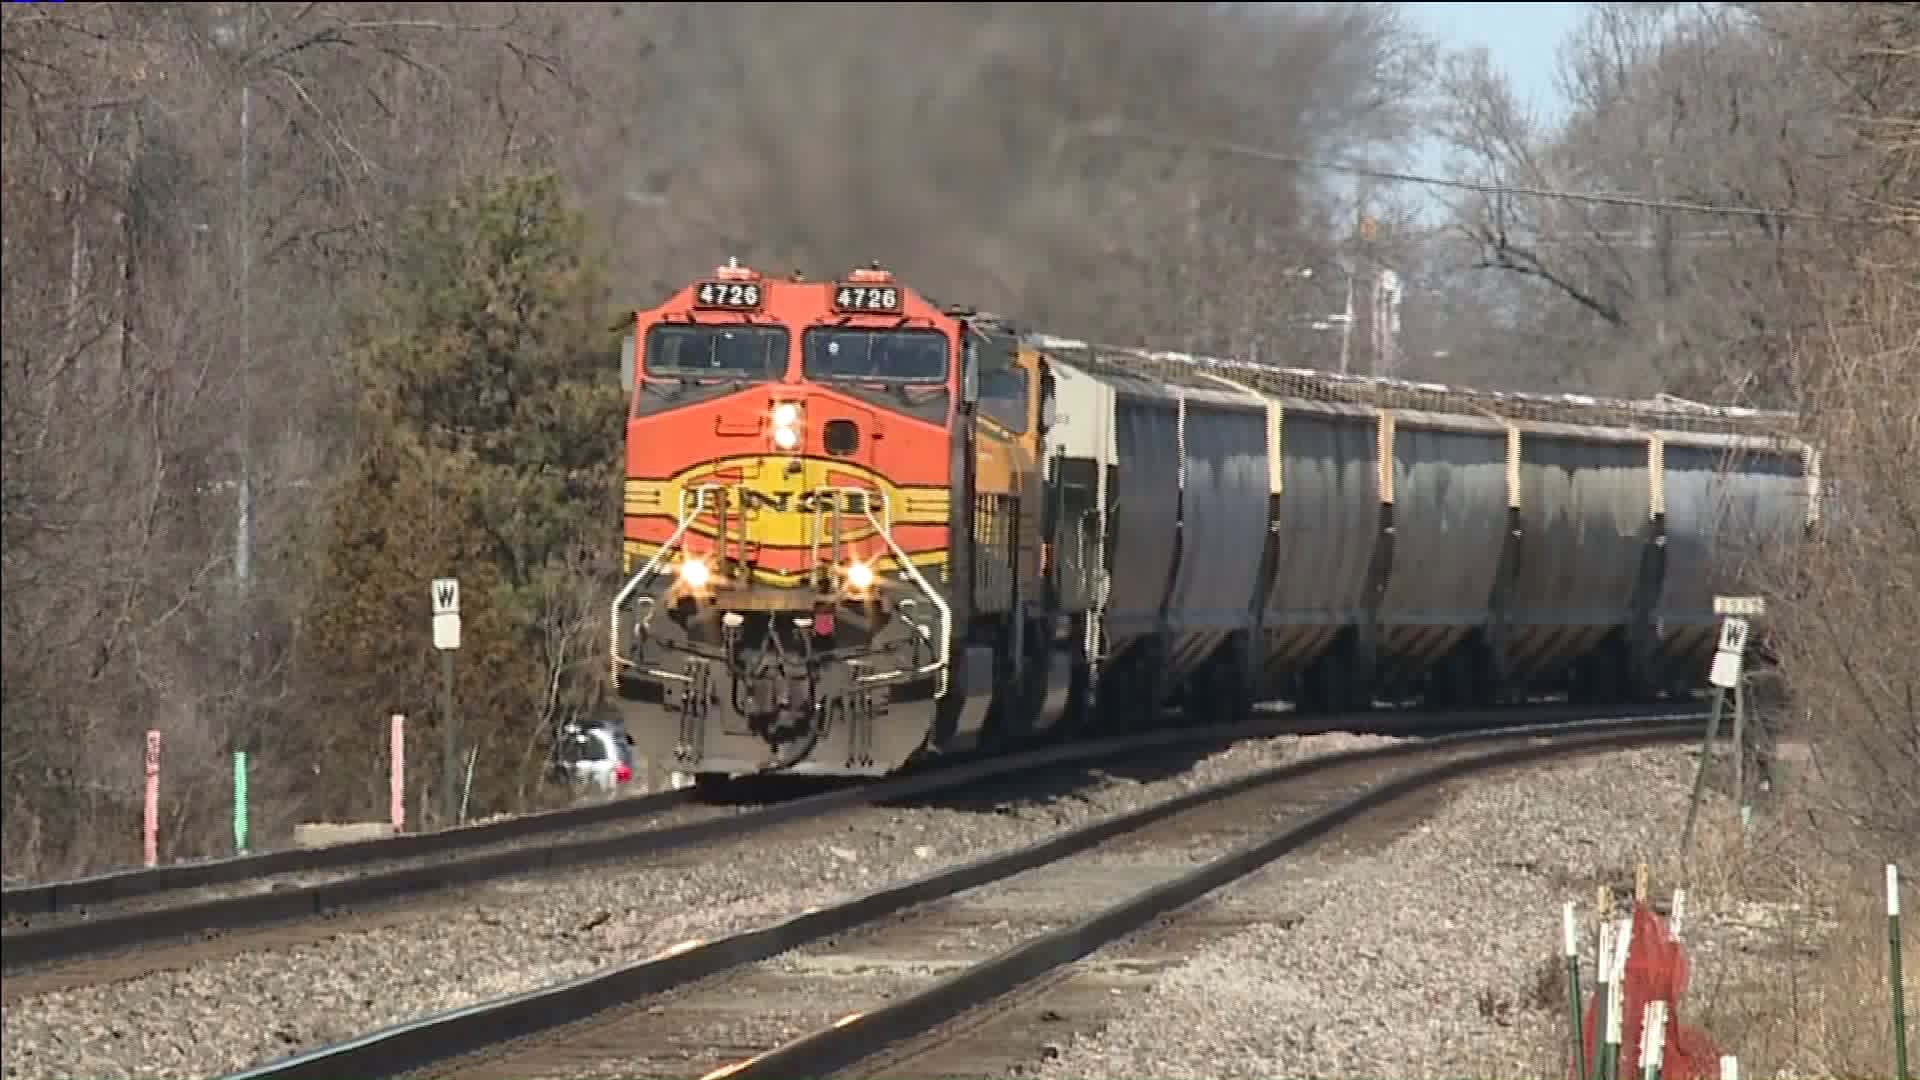 Train on the tracks - Olathe